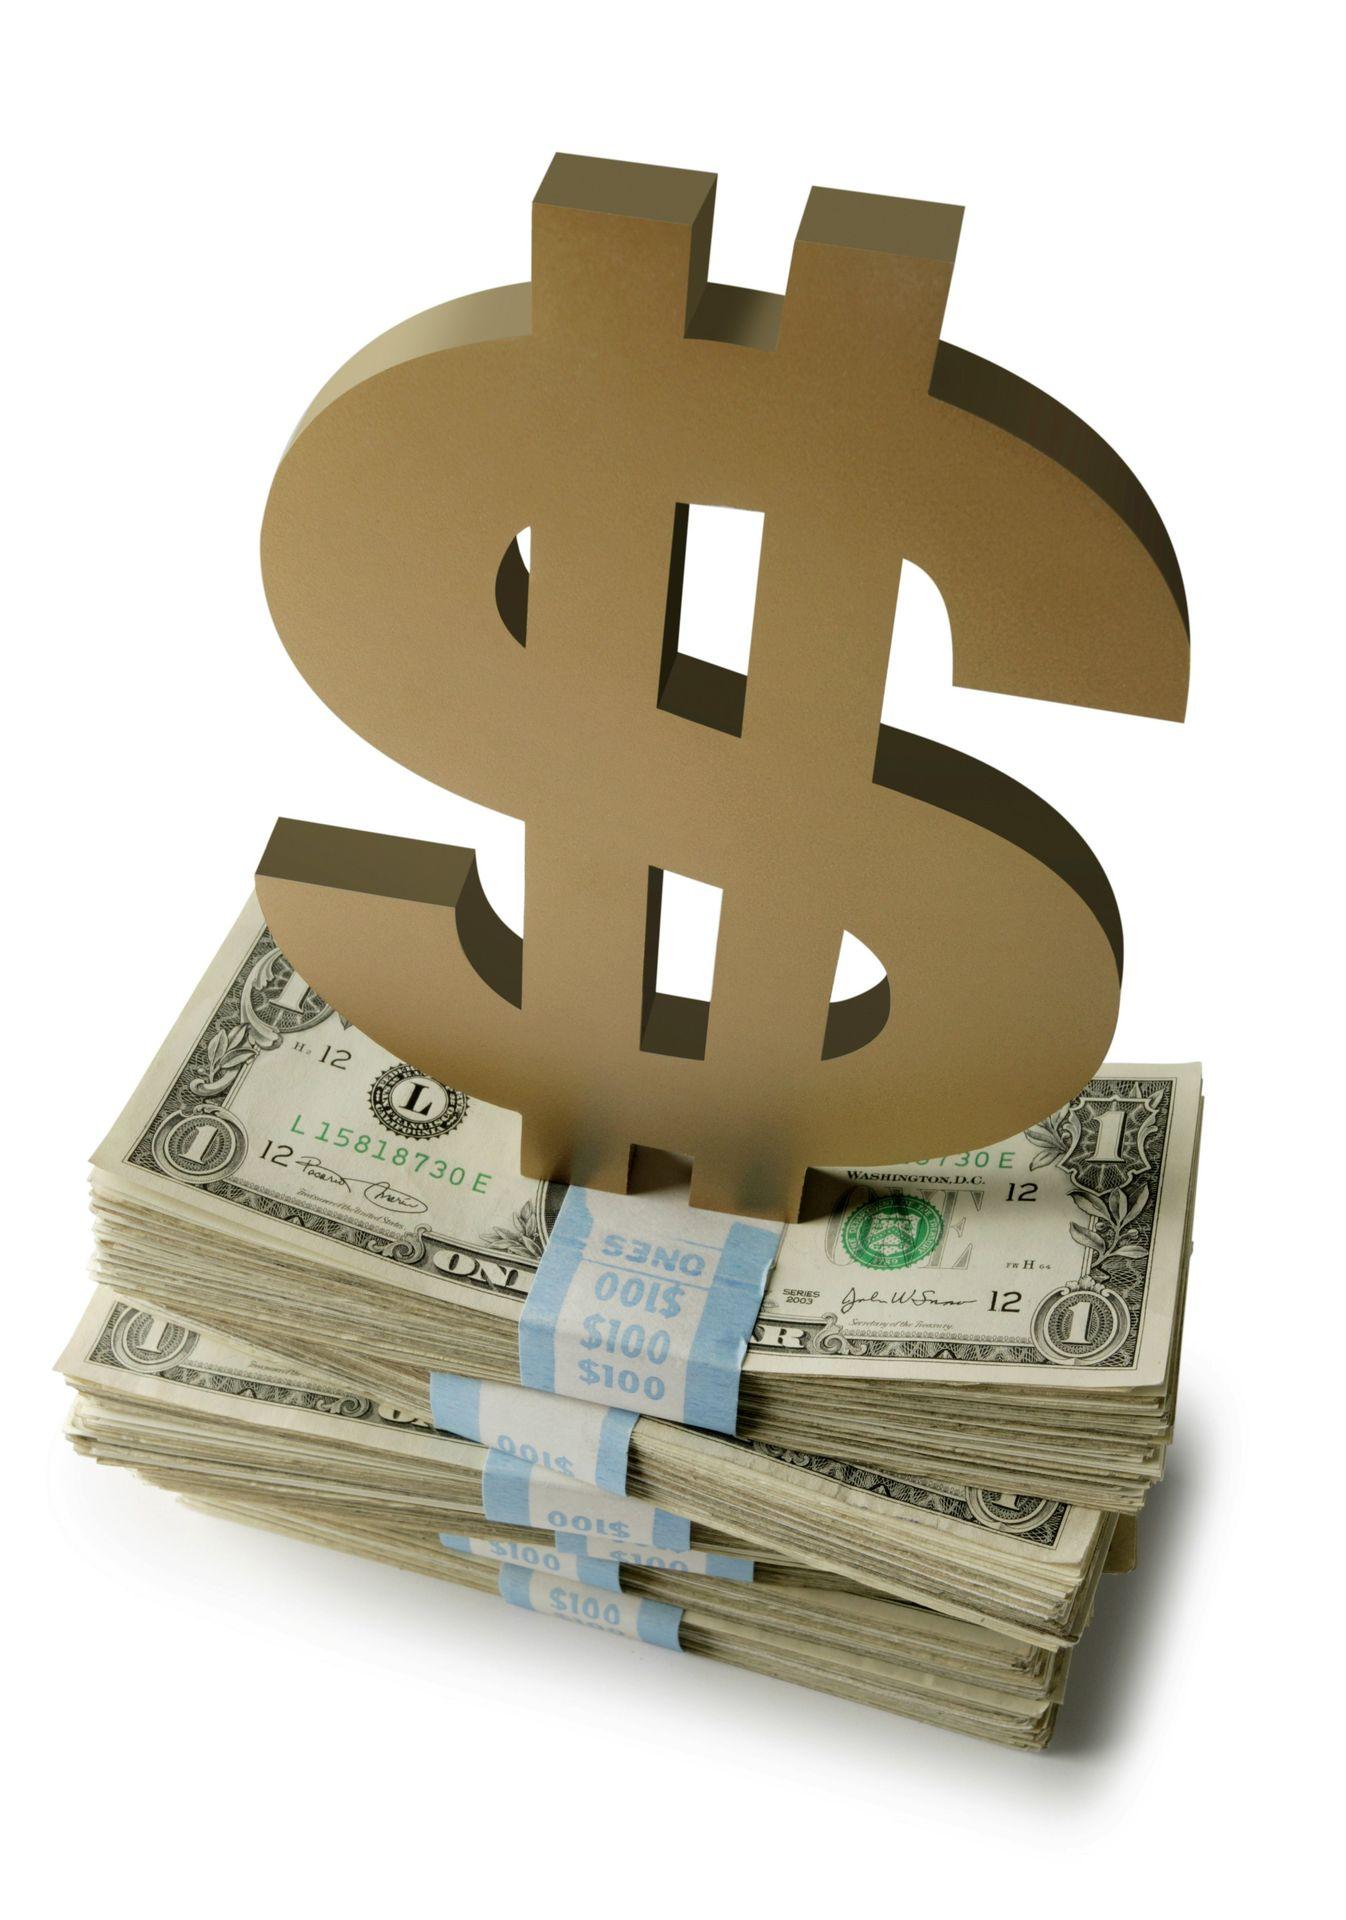 STEPS TO MAKE Money Working Online